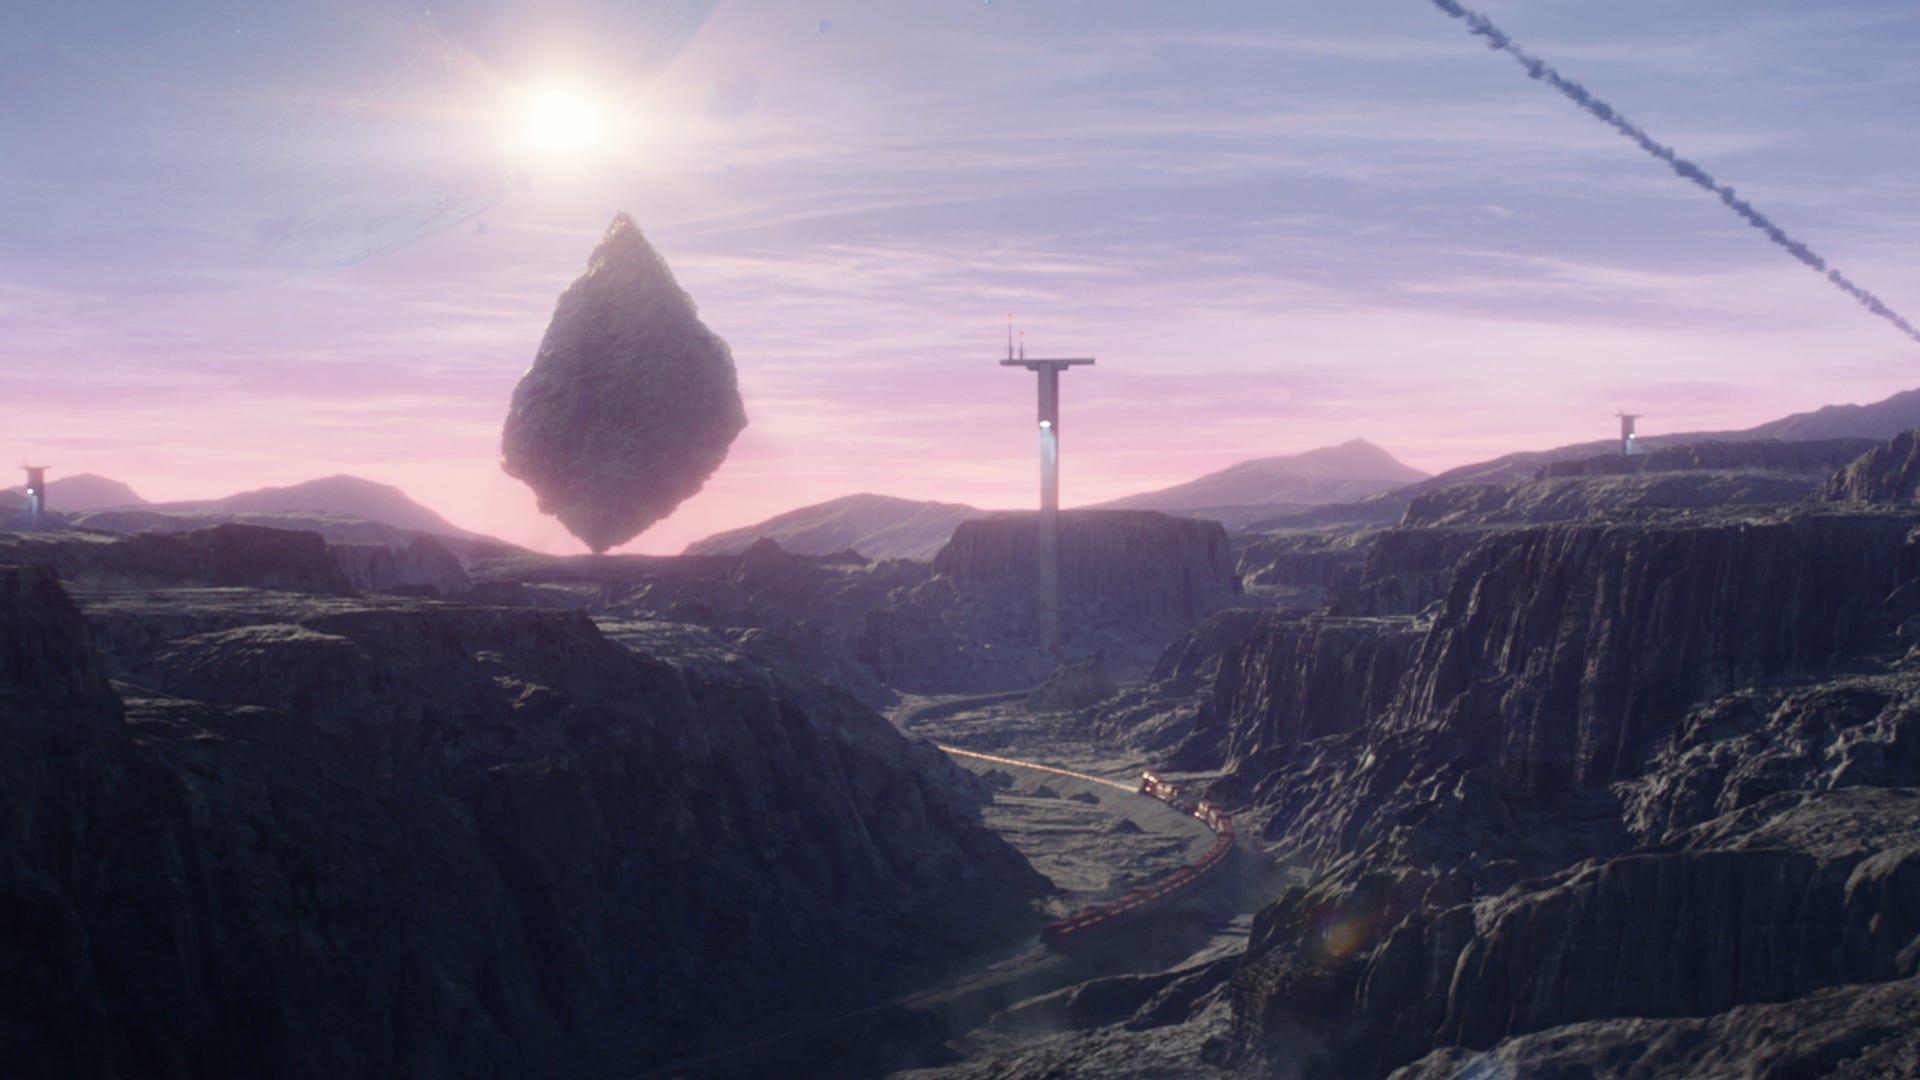 A chuck of planet crashing into a landscape.